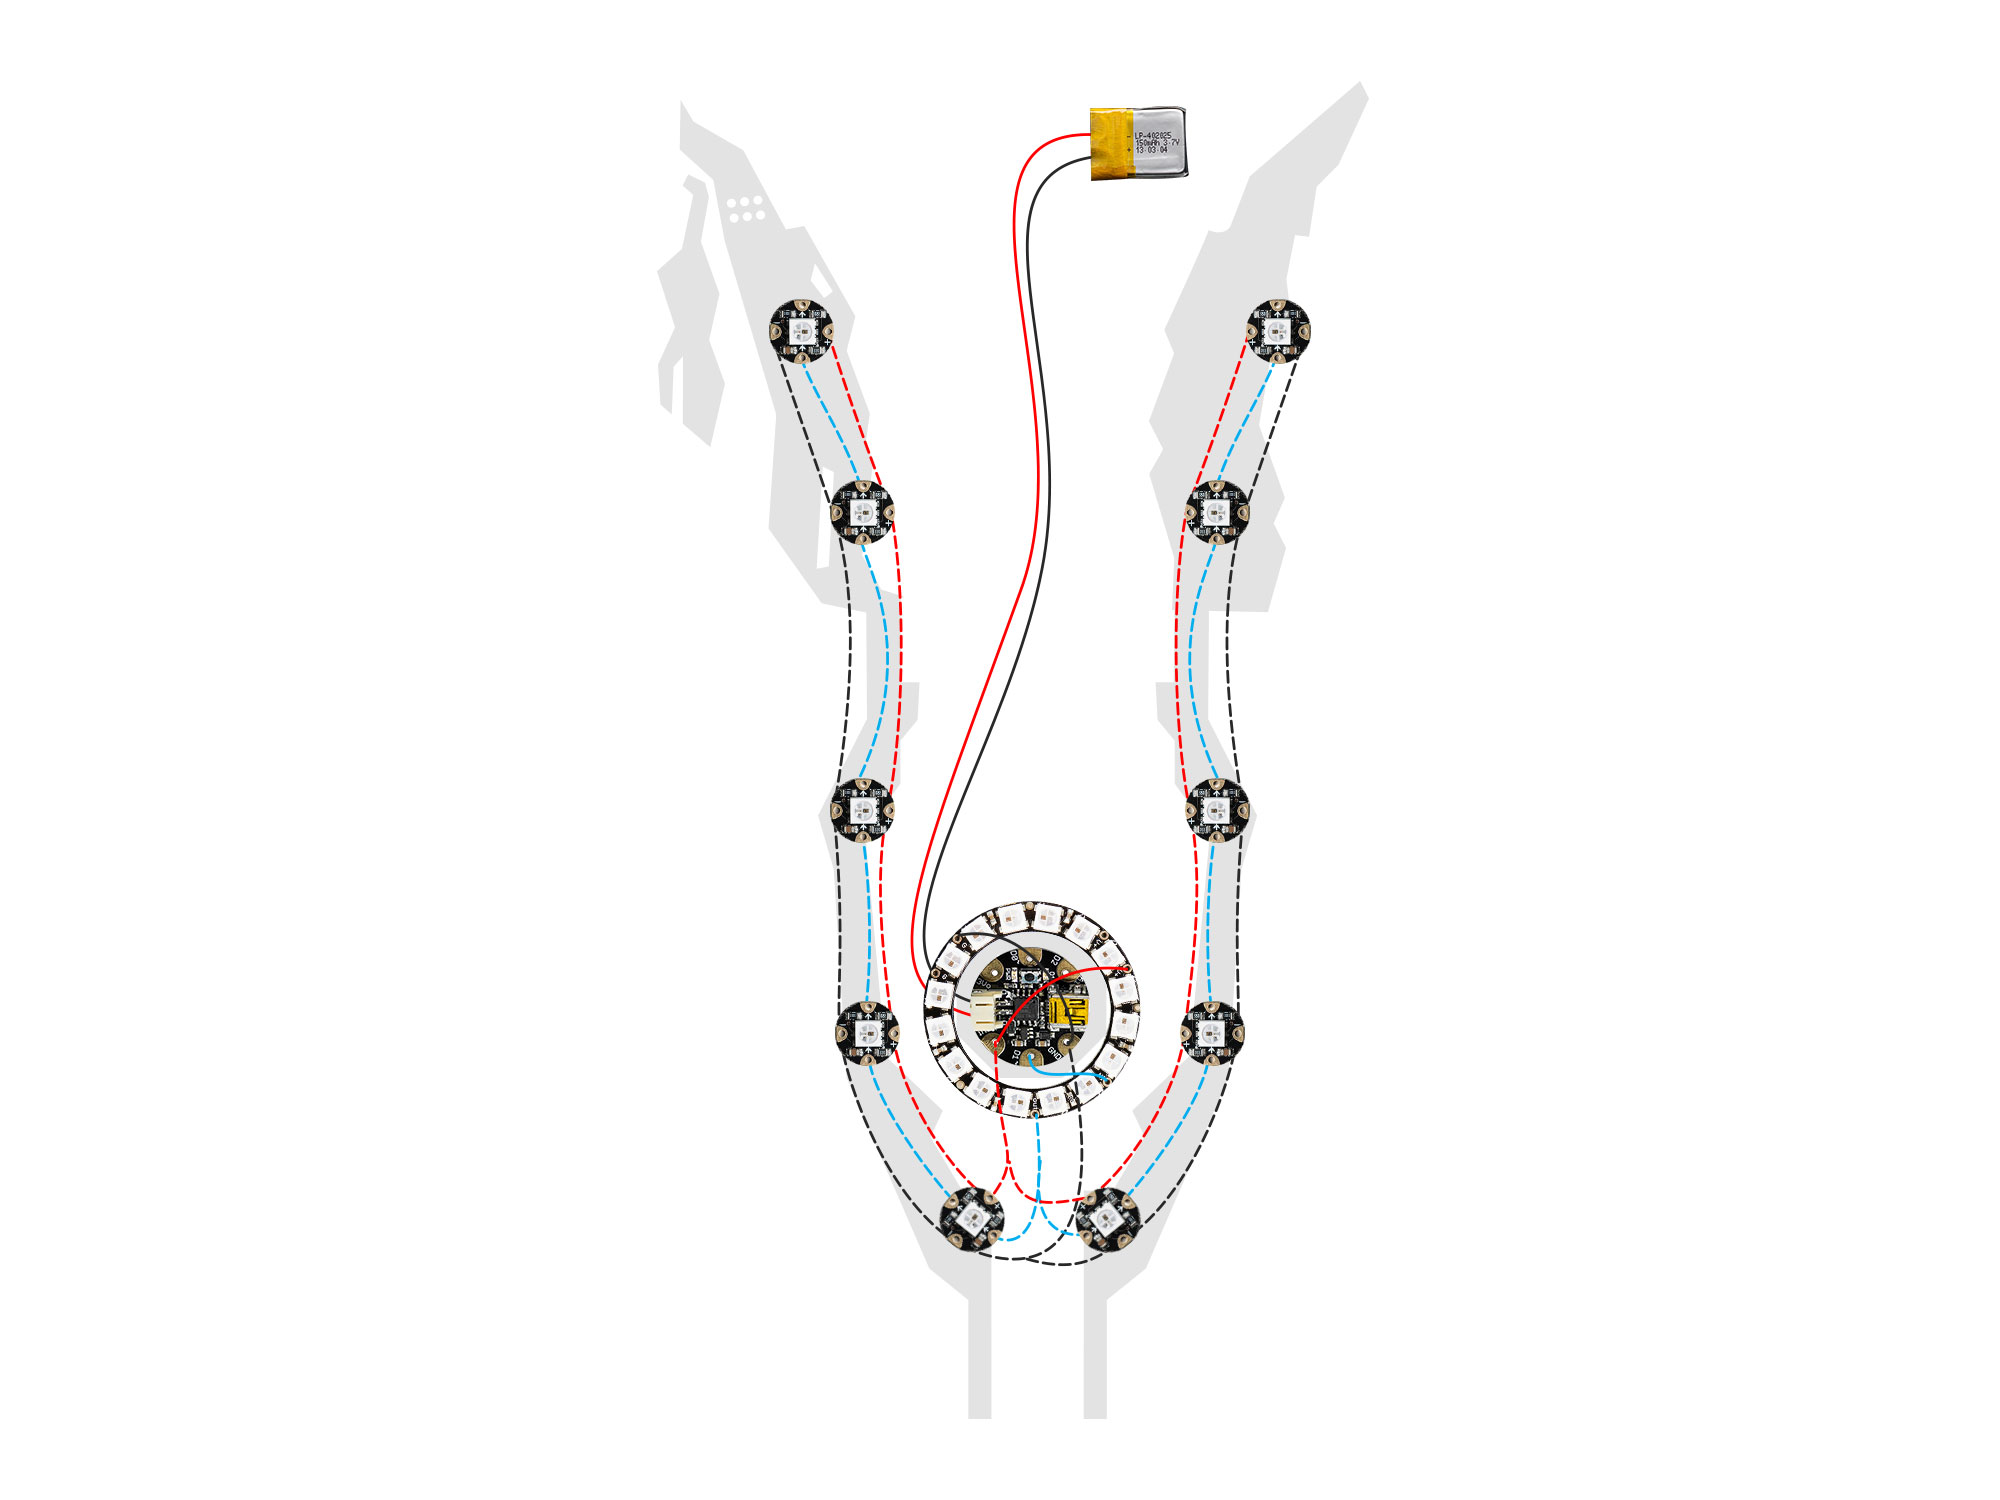 leds_cortana-circuit.jpg